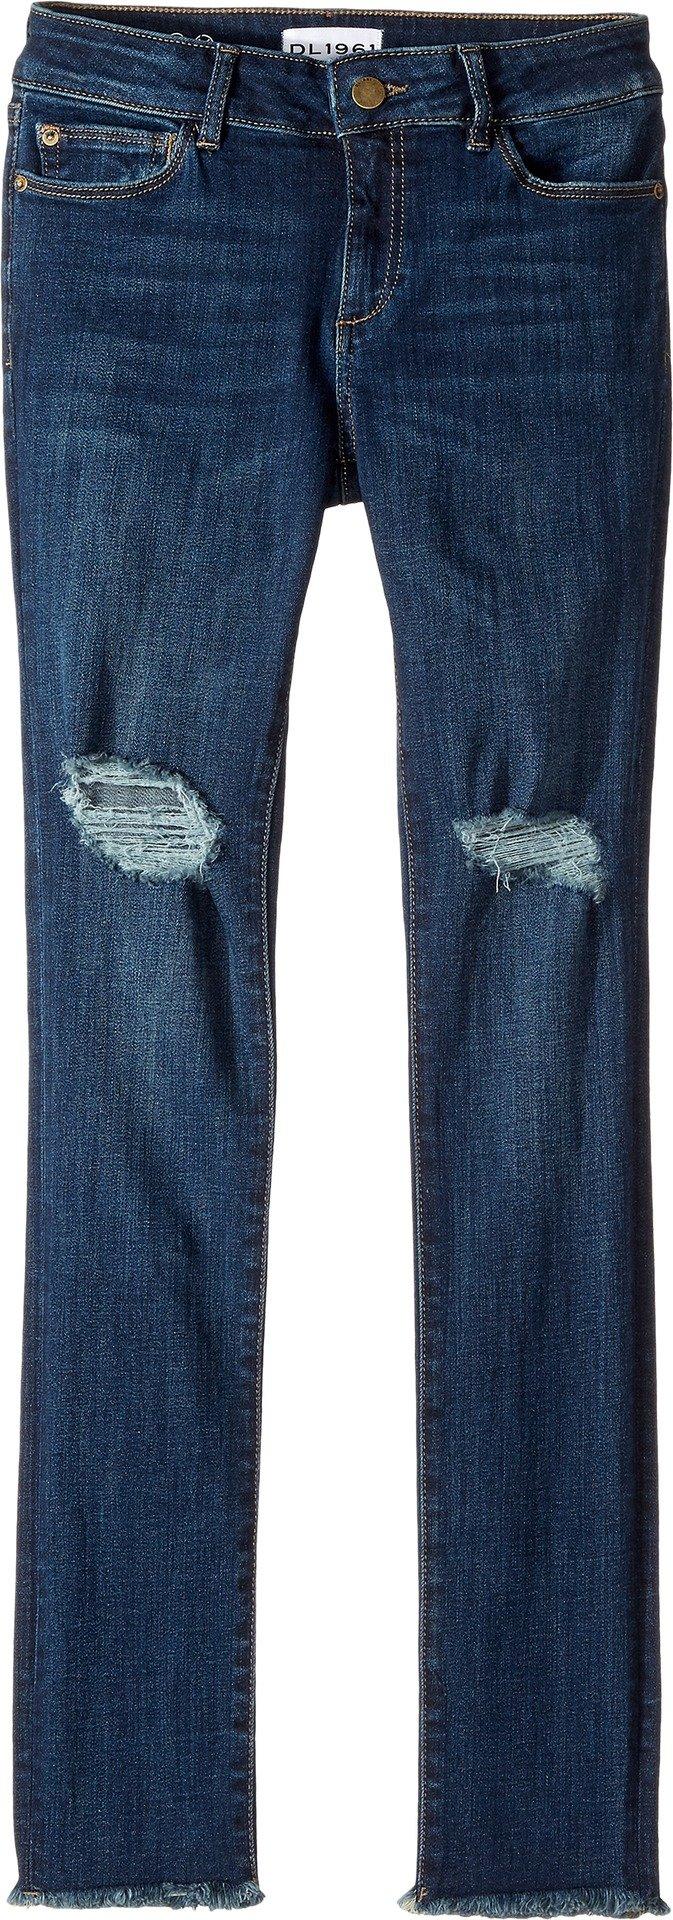 DL1961 Kids Girl's Chloe Skinny Jeans in Willow (Big Kids) Willow 16